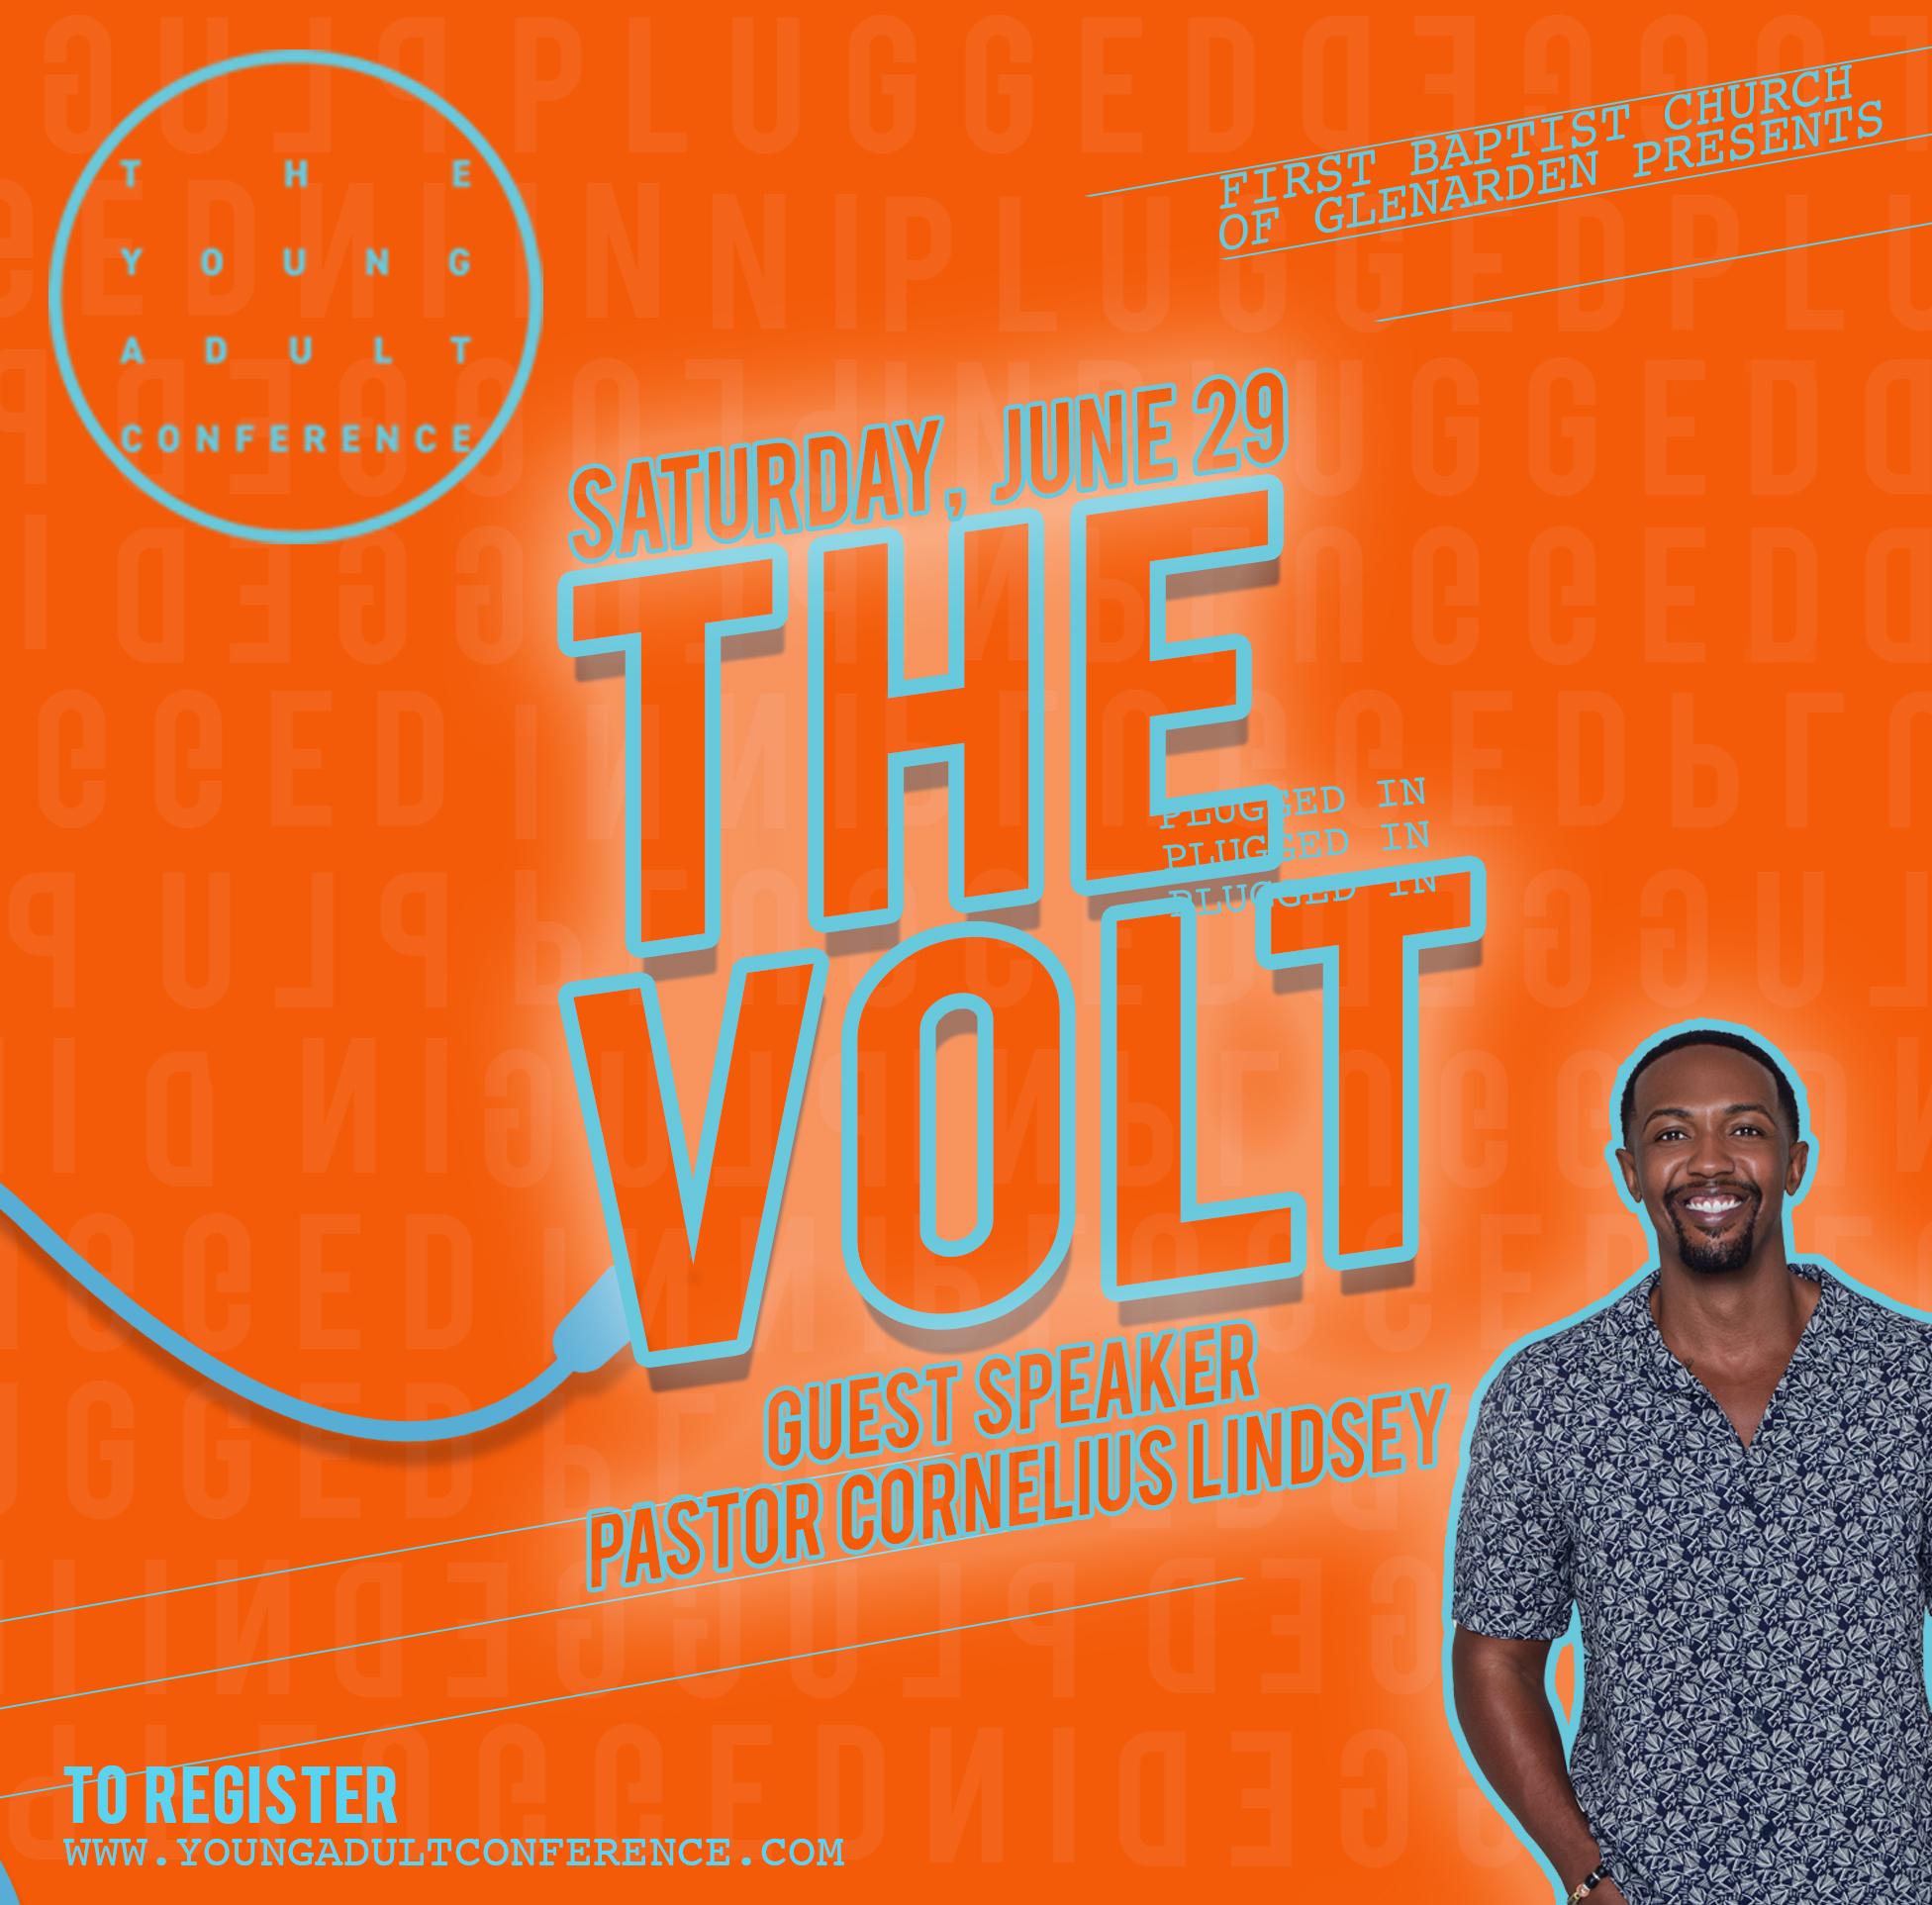 The Volt - C Lindsey.jpg